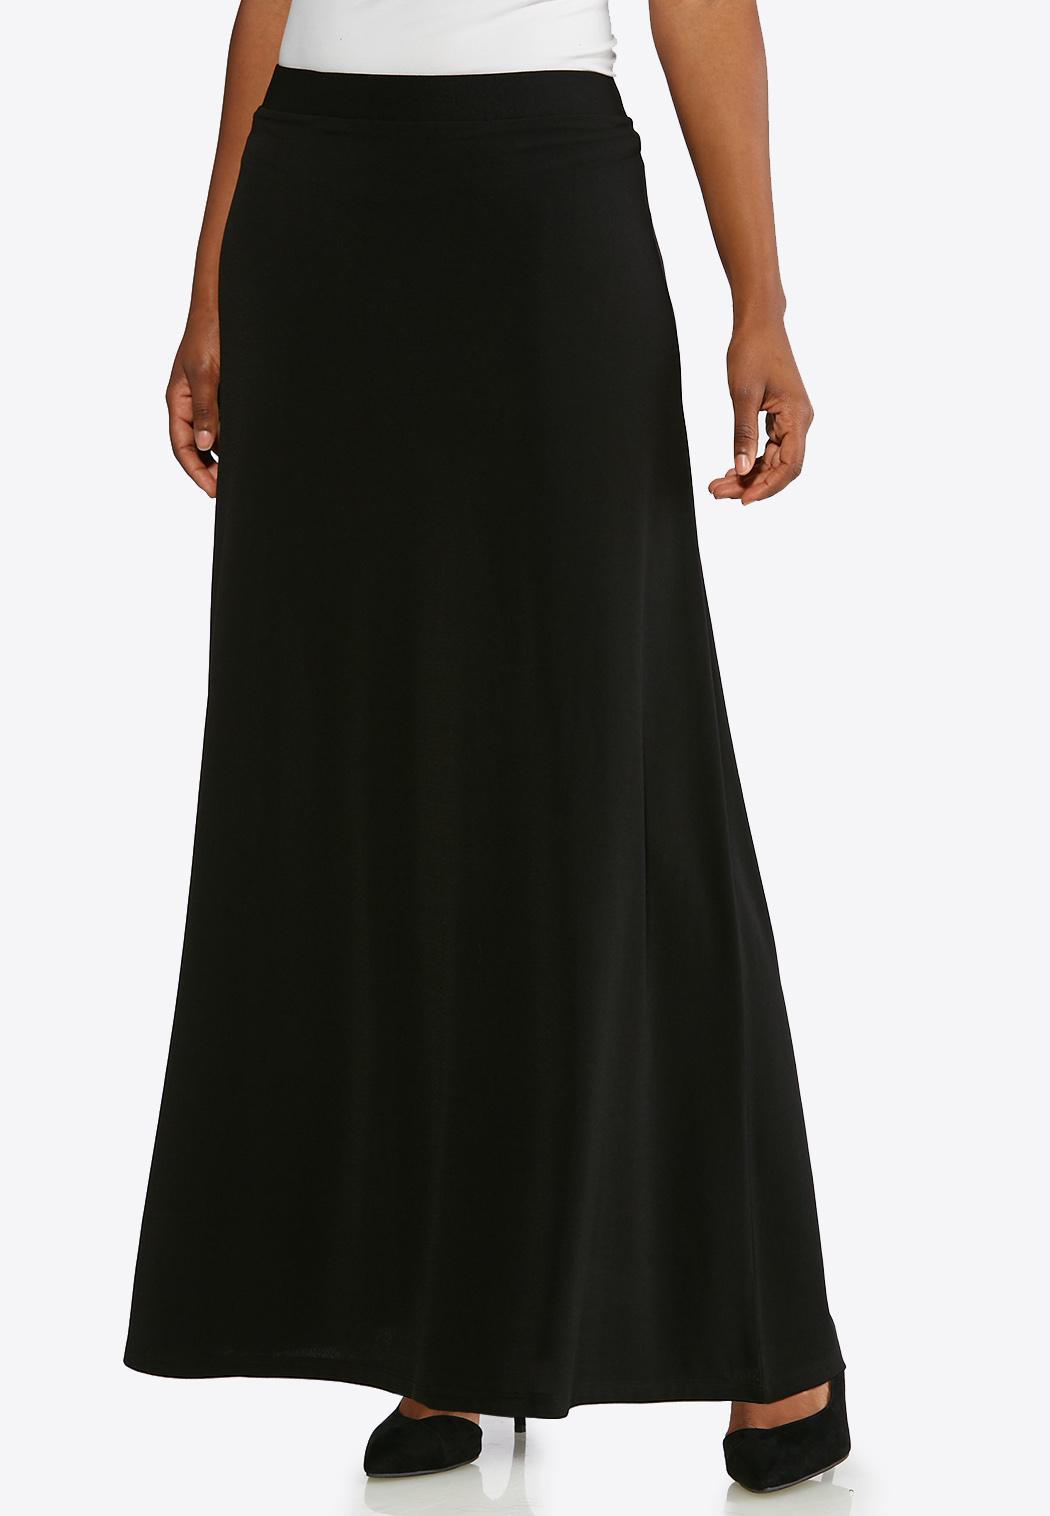 a92b851842c Solid Black Maxi Skirt alternate view Solid Black Maxi Skirt